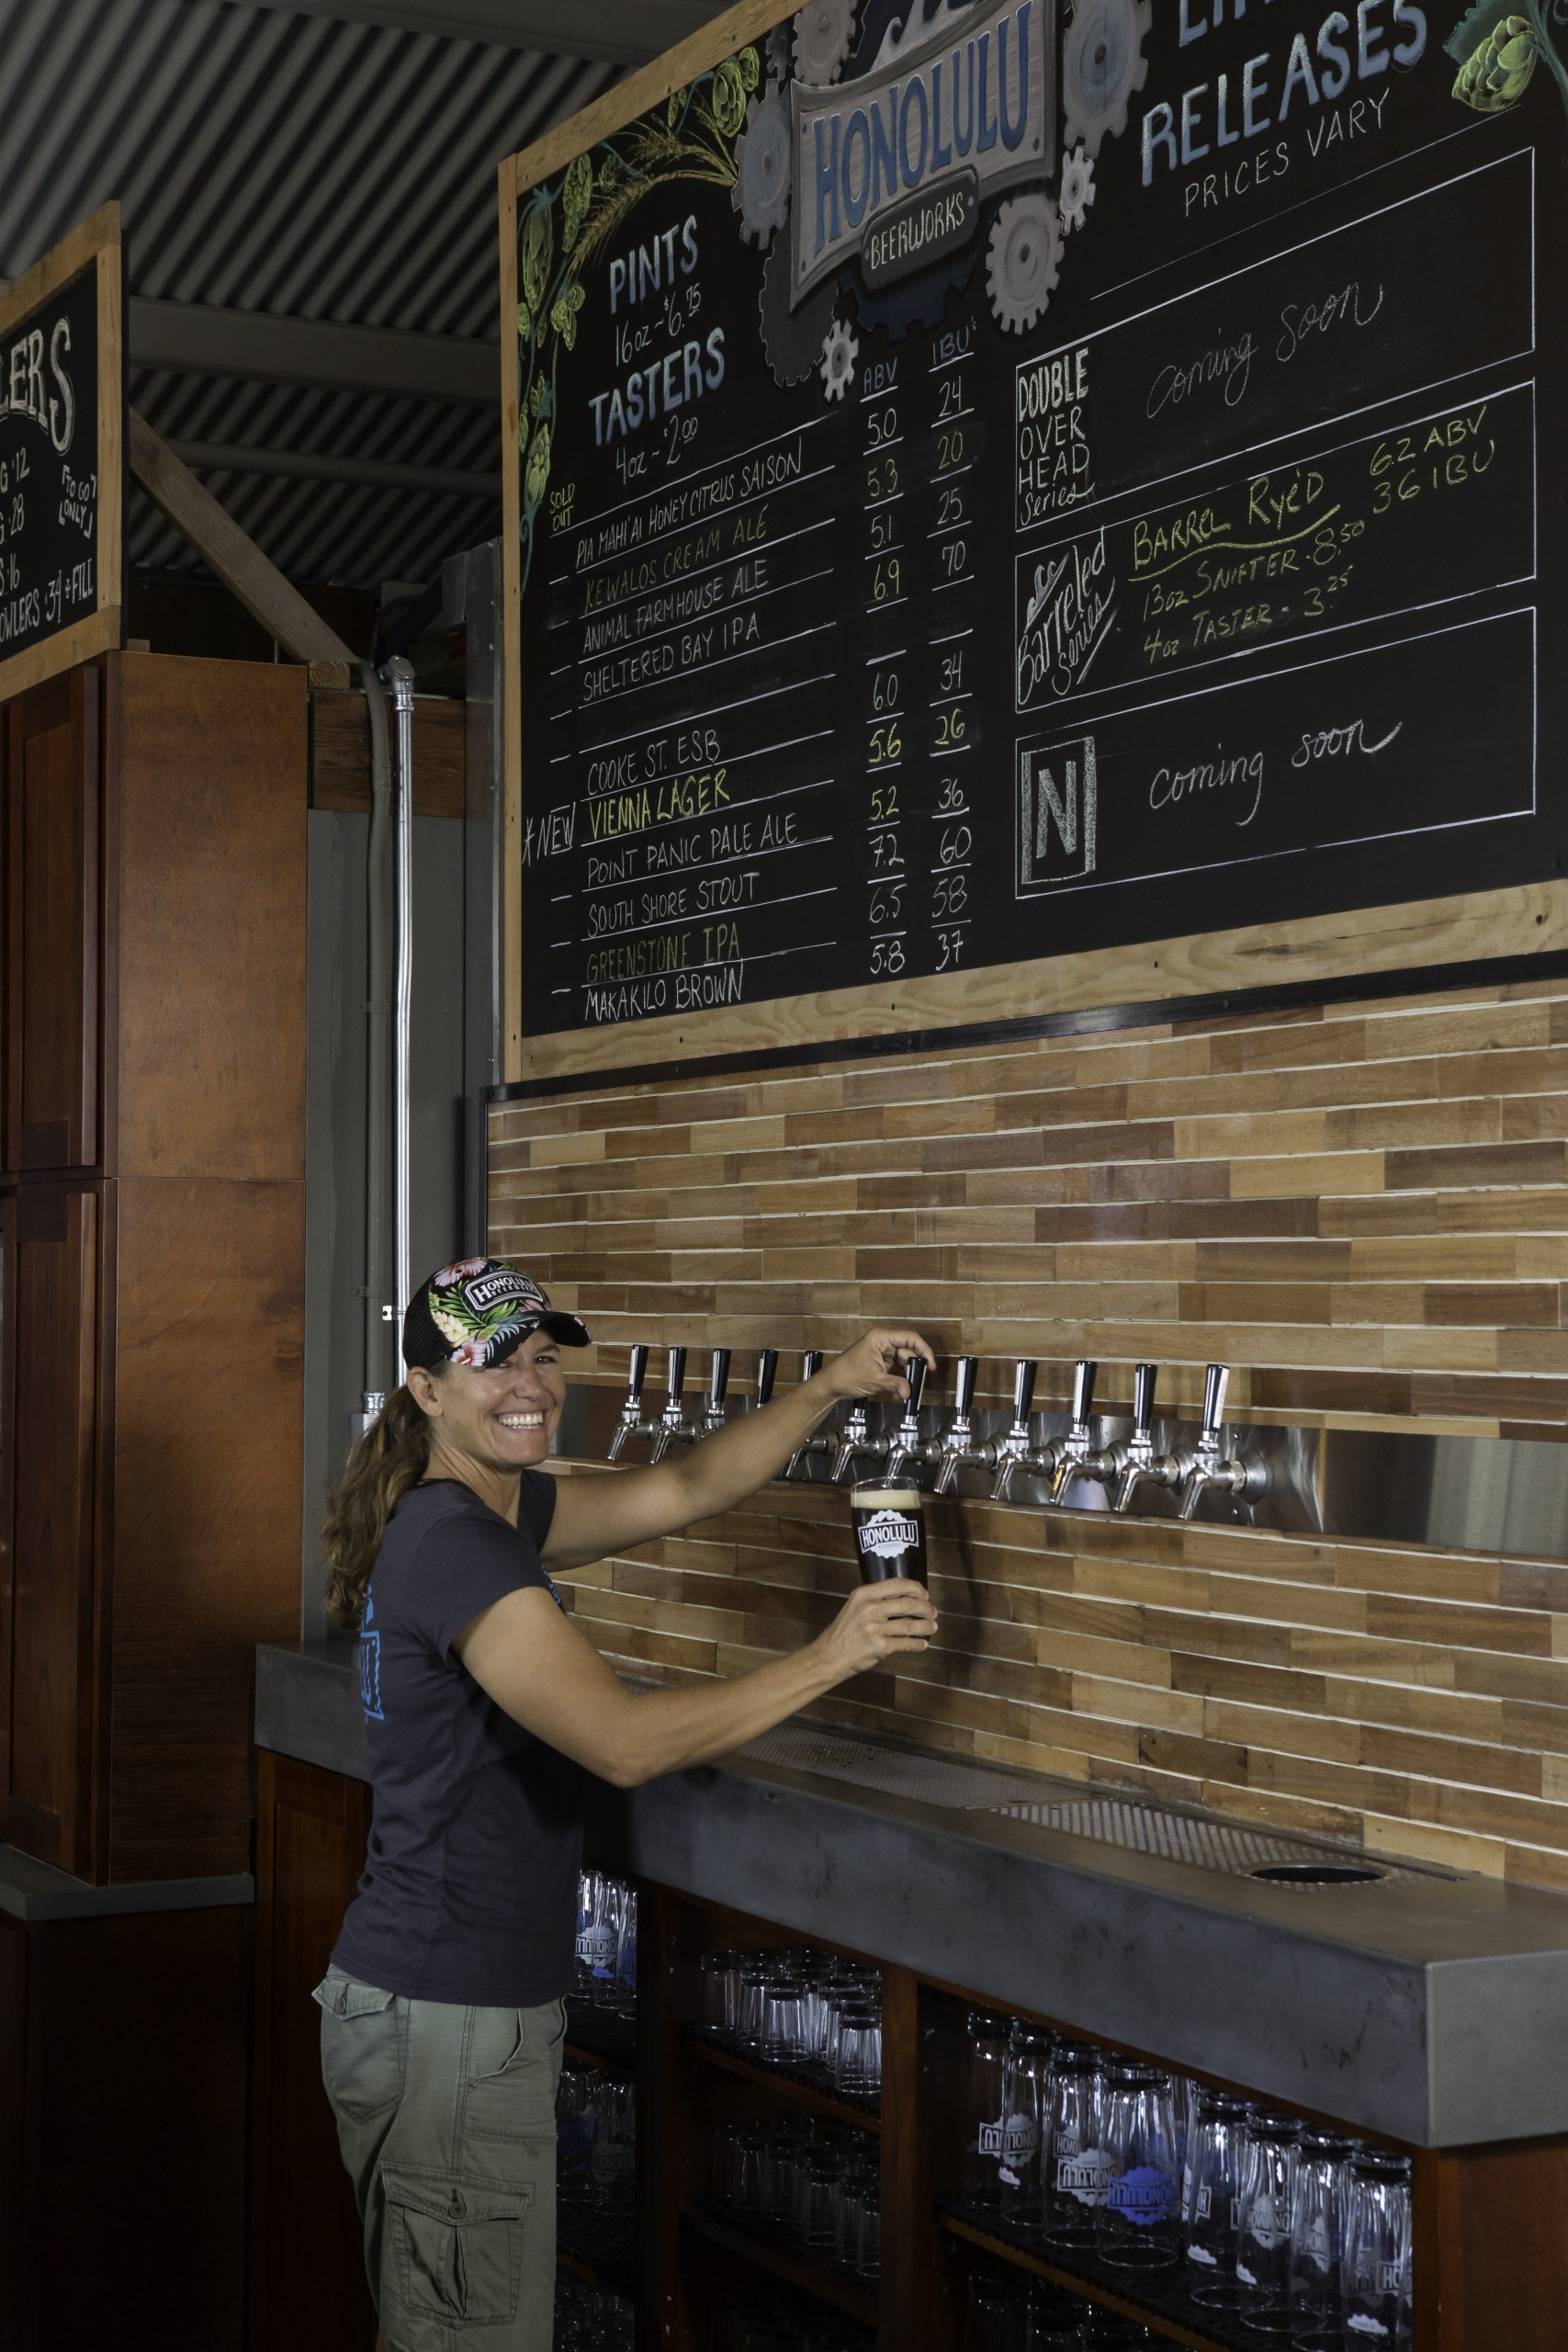 Roxayne Spruance pours a glass at Honolulu Beerworks. Photo: David Croxford